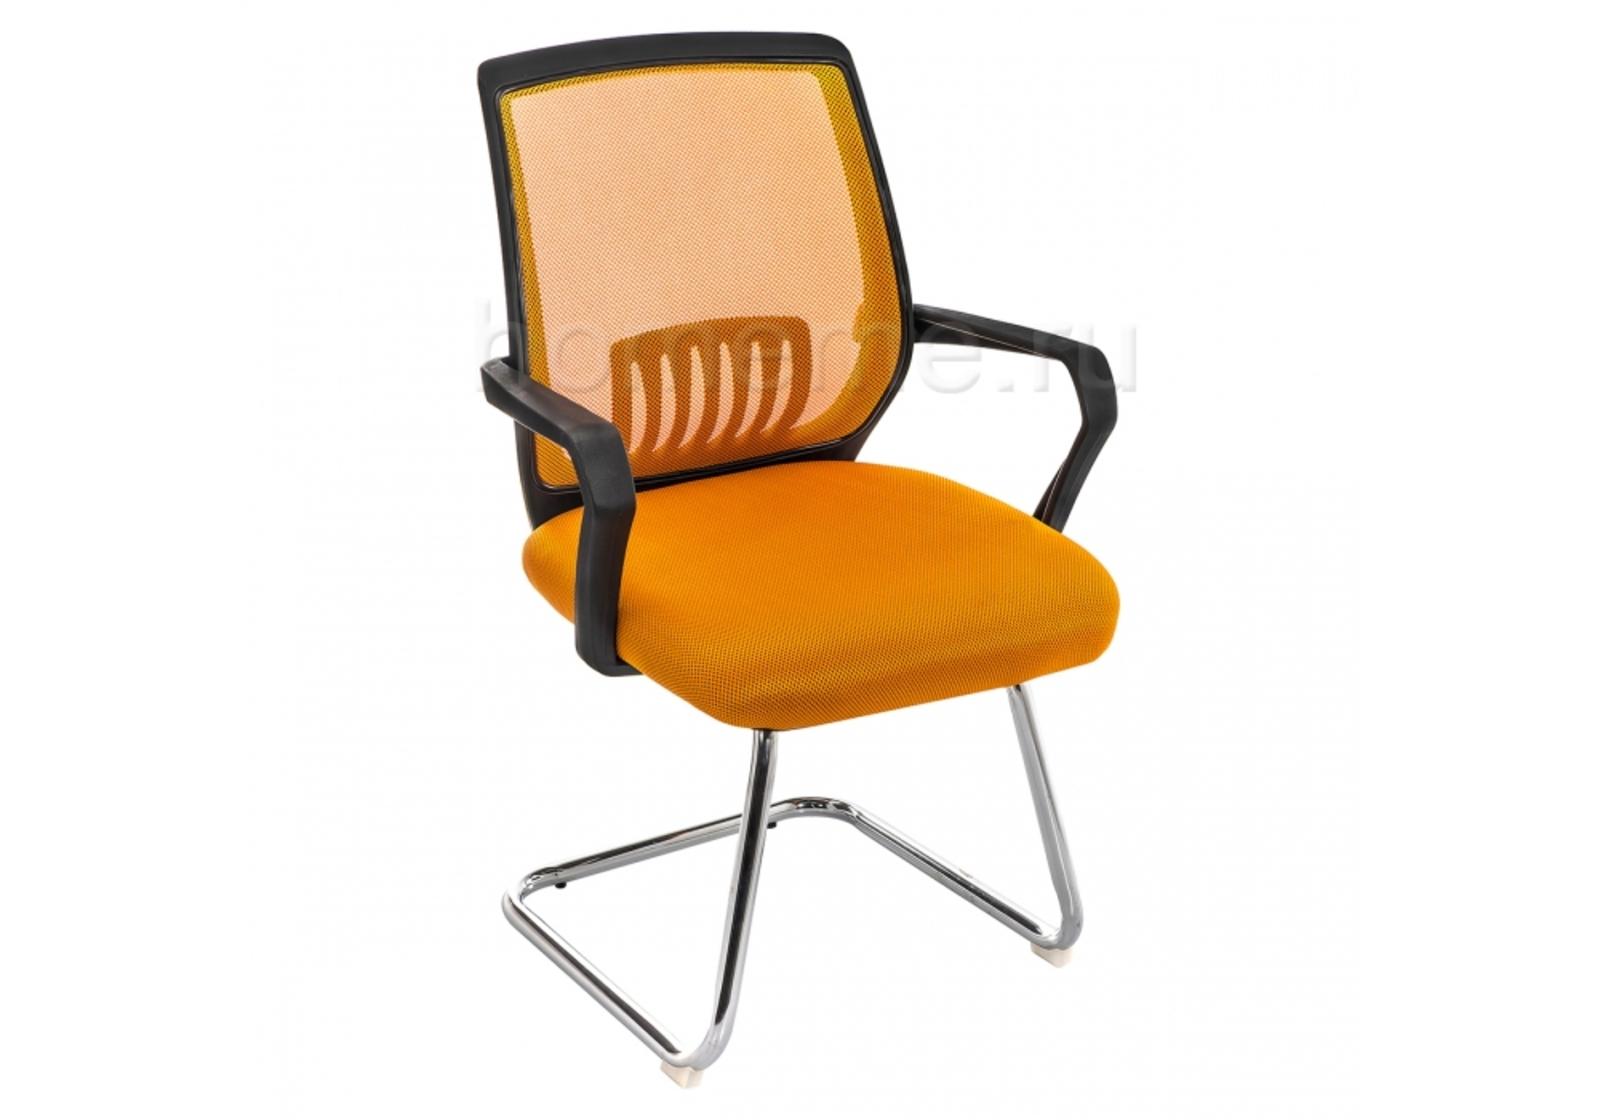 Стул Point оранжевый / черный 11520 Point оранжевый / черный 11520 (17475)